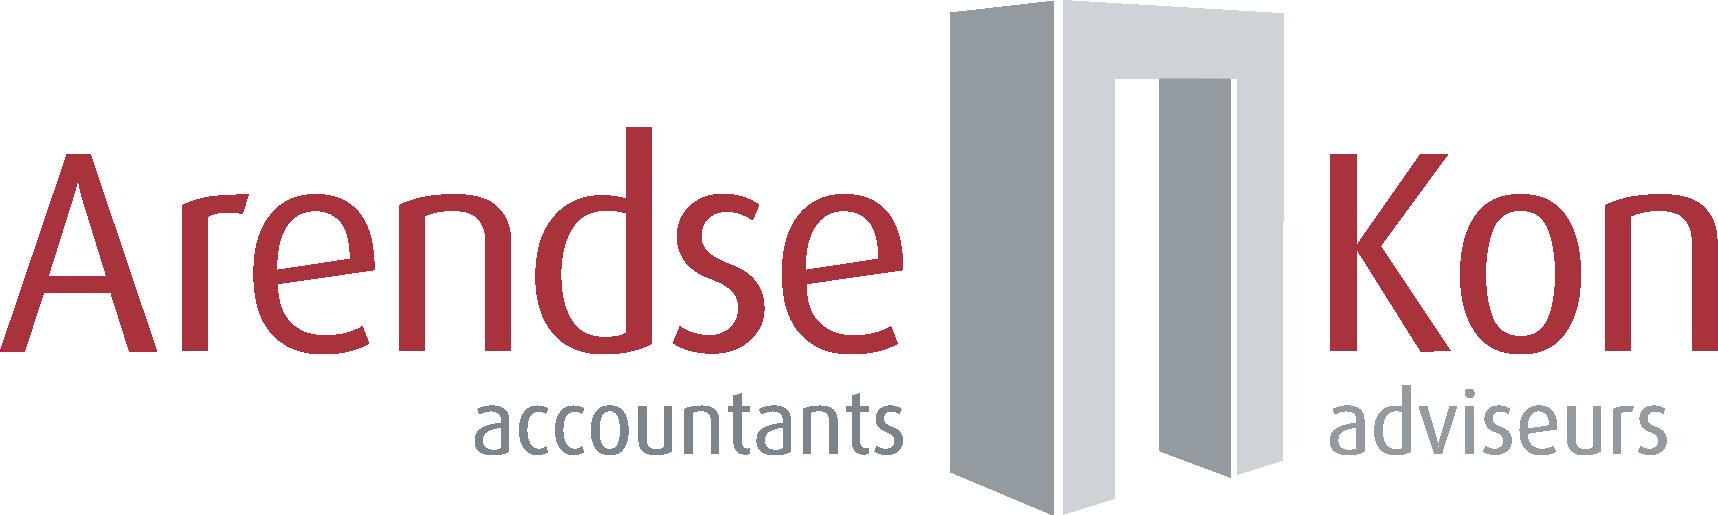 Arendse & Kon - Accountants en Belastingadviseurs